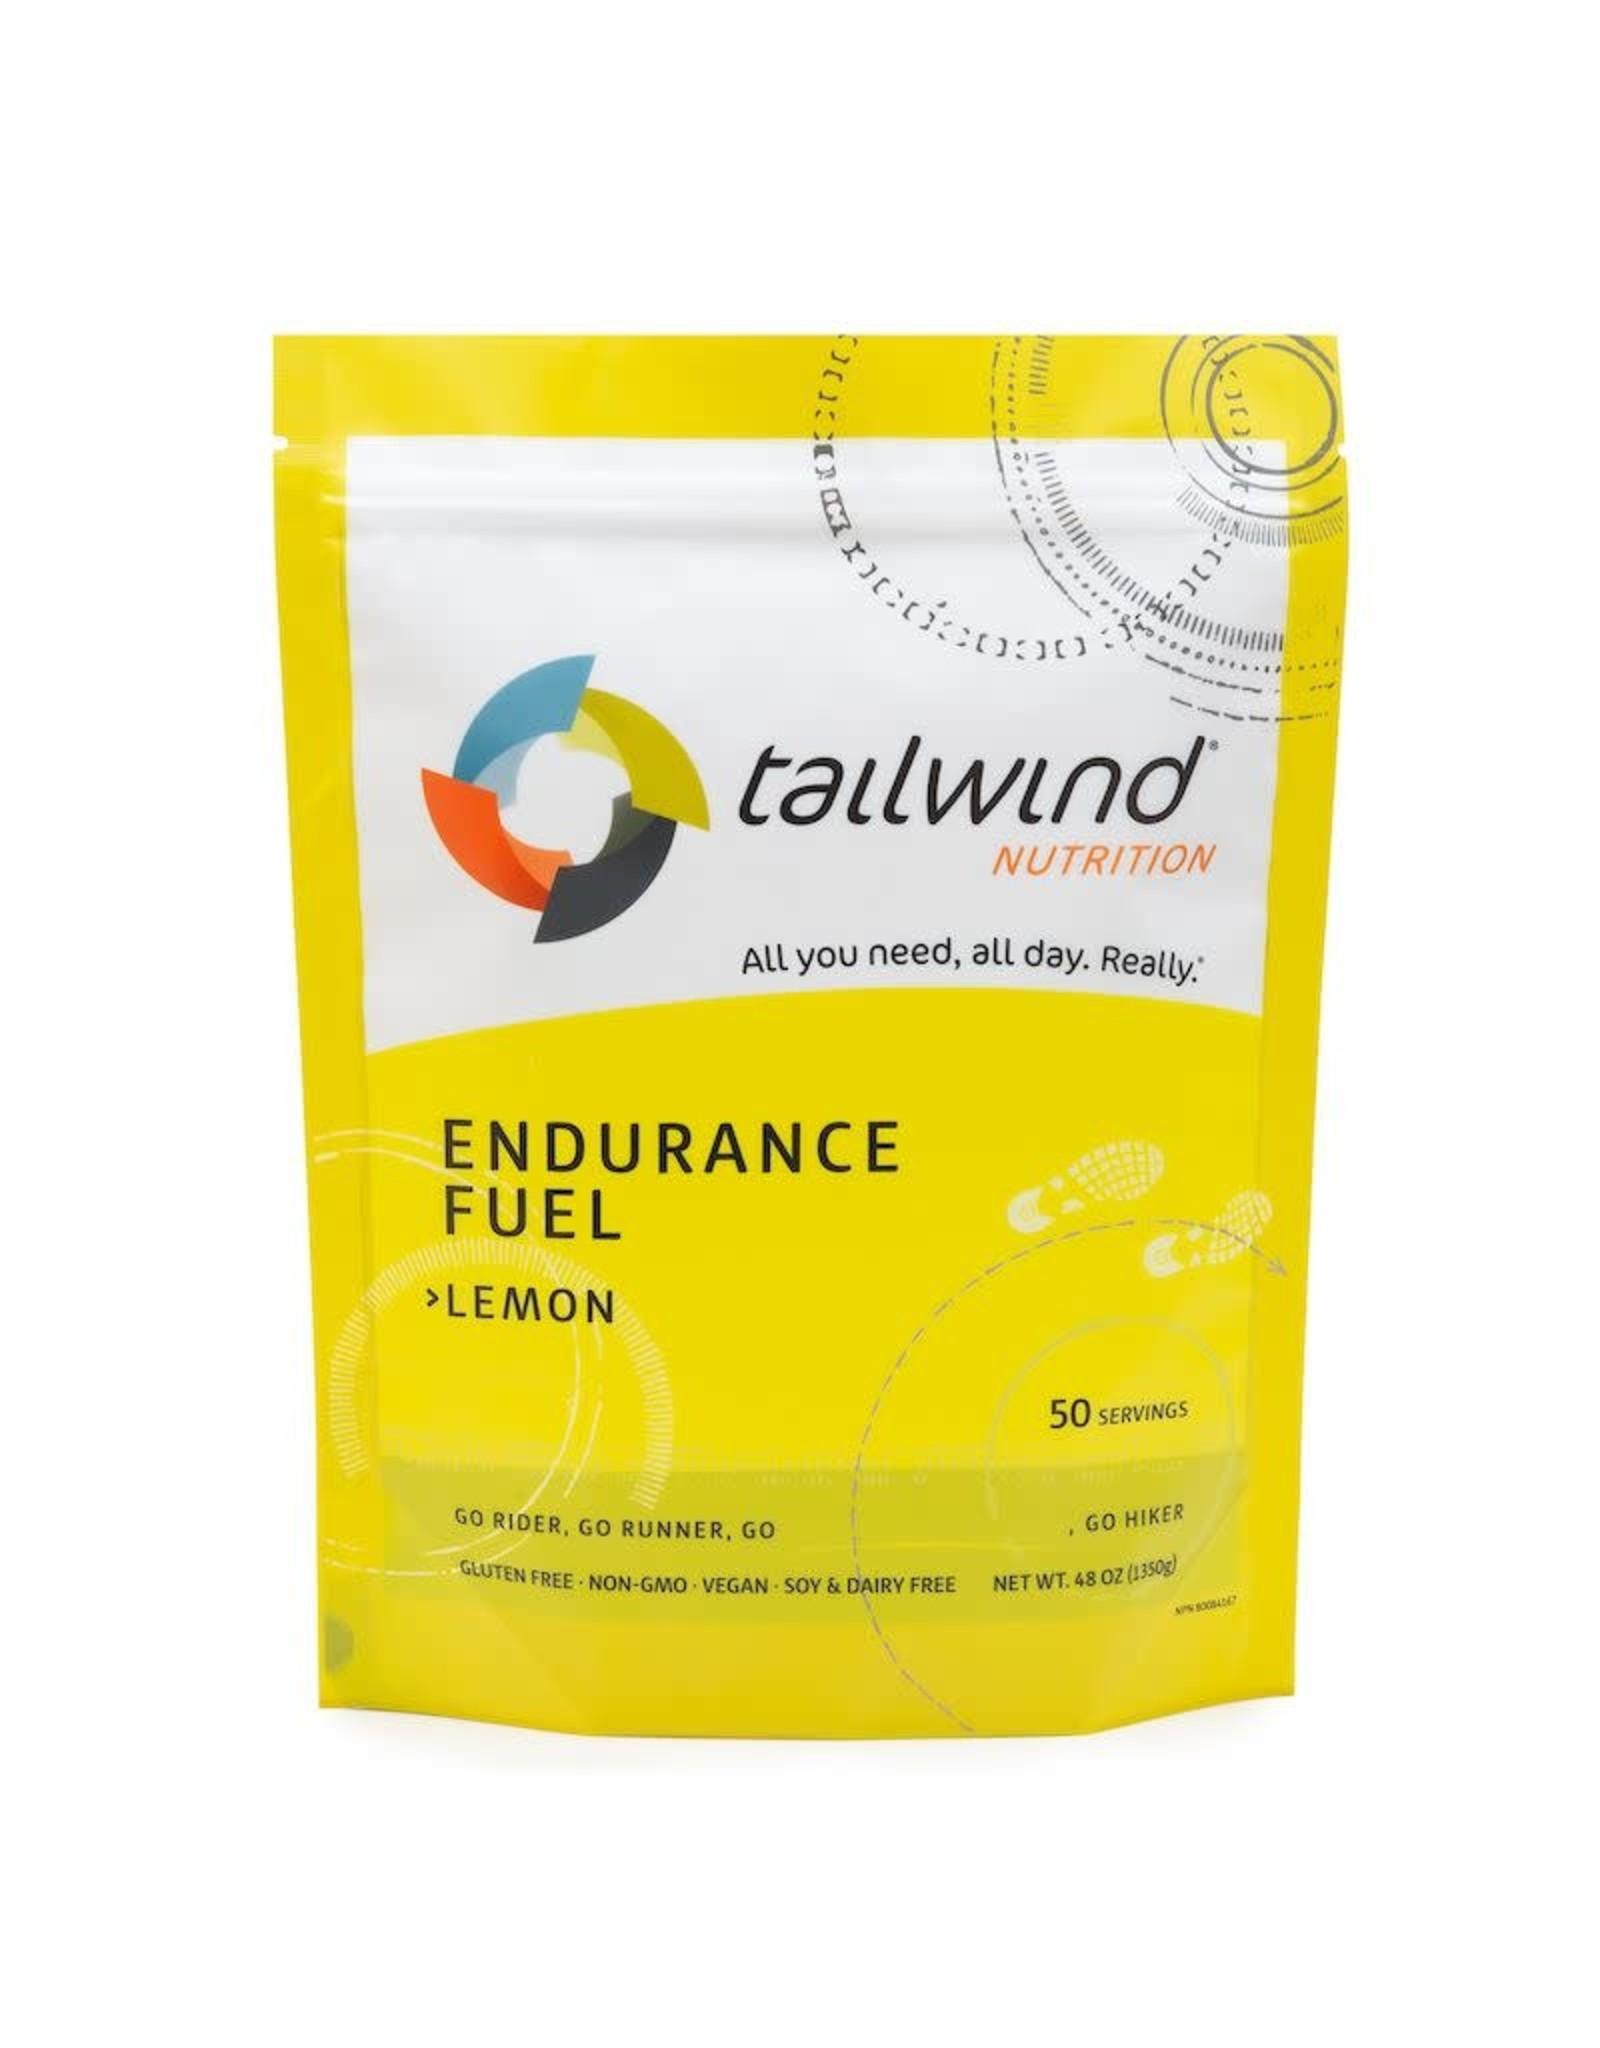 Tailwind Nutrition Endurance Fuel Tailwind Lemon (50 servings)